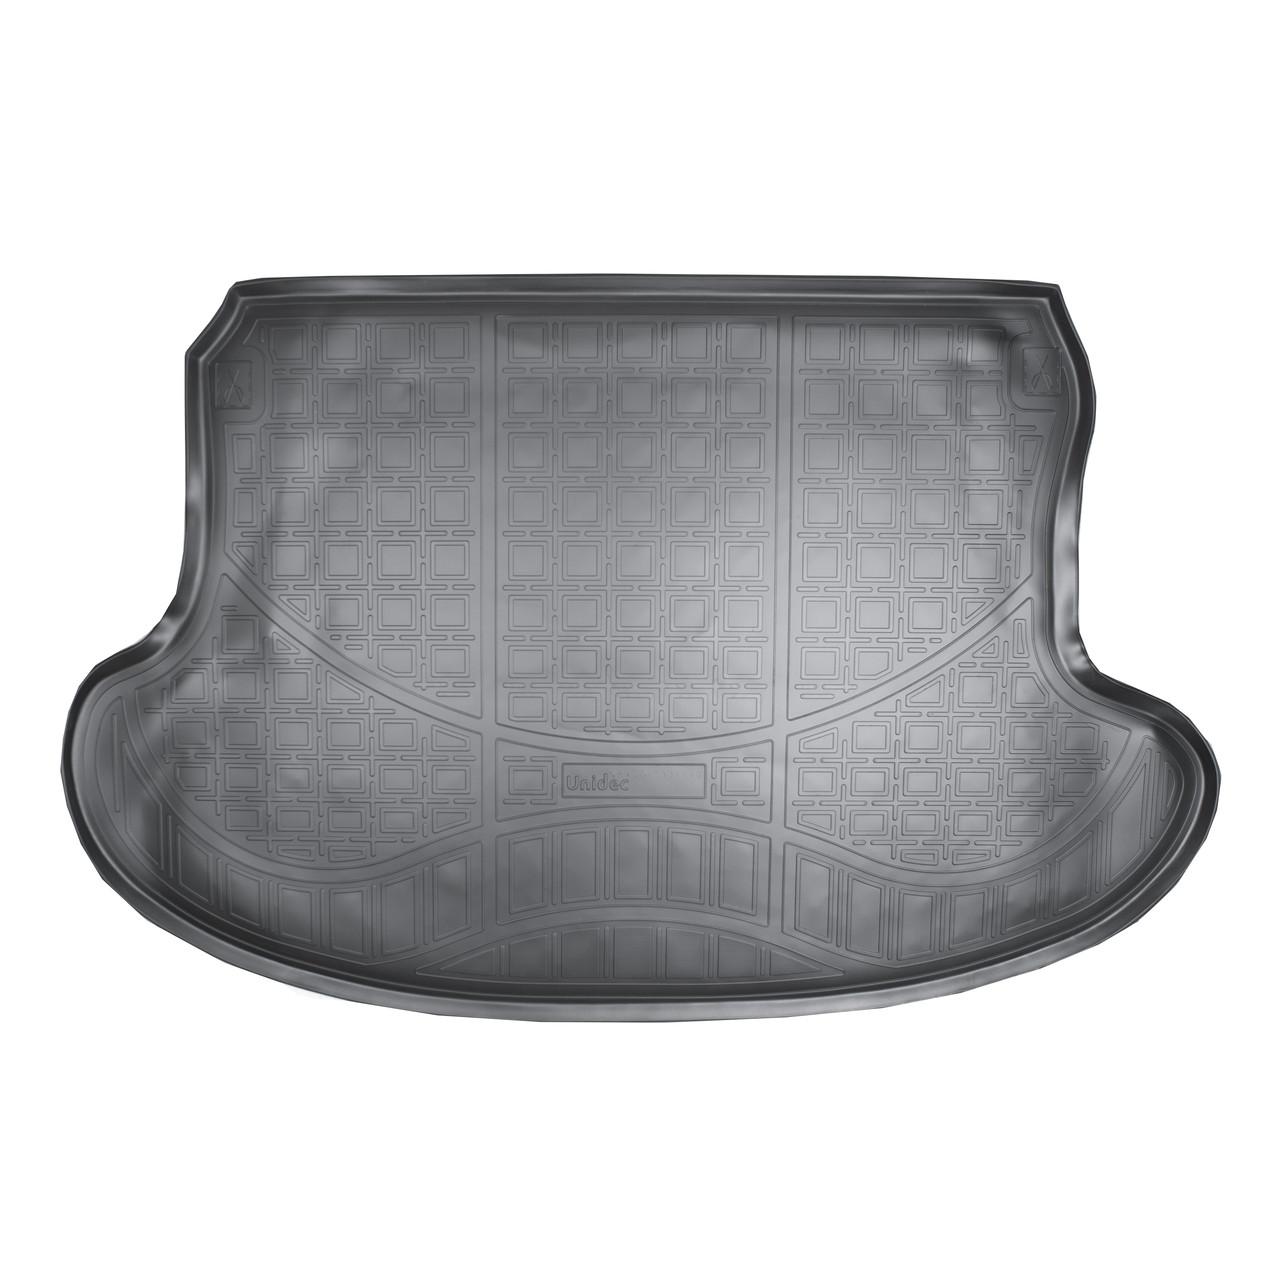 Коврик в багажник Infiniti FX (S51) (2012-2014)\QX 70 (2013-2017)